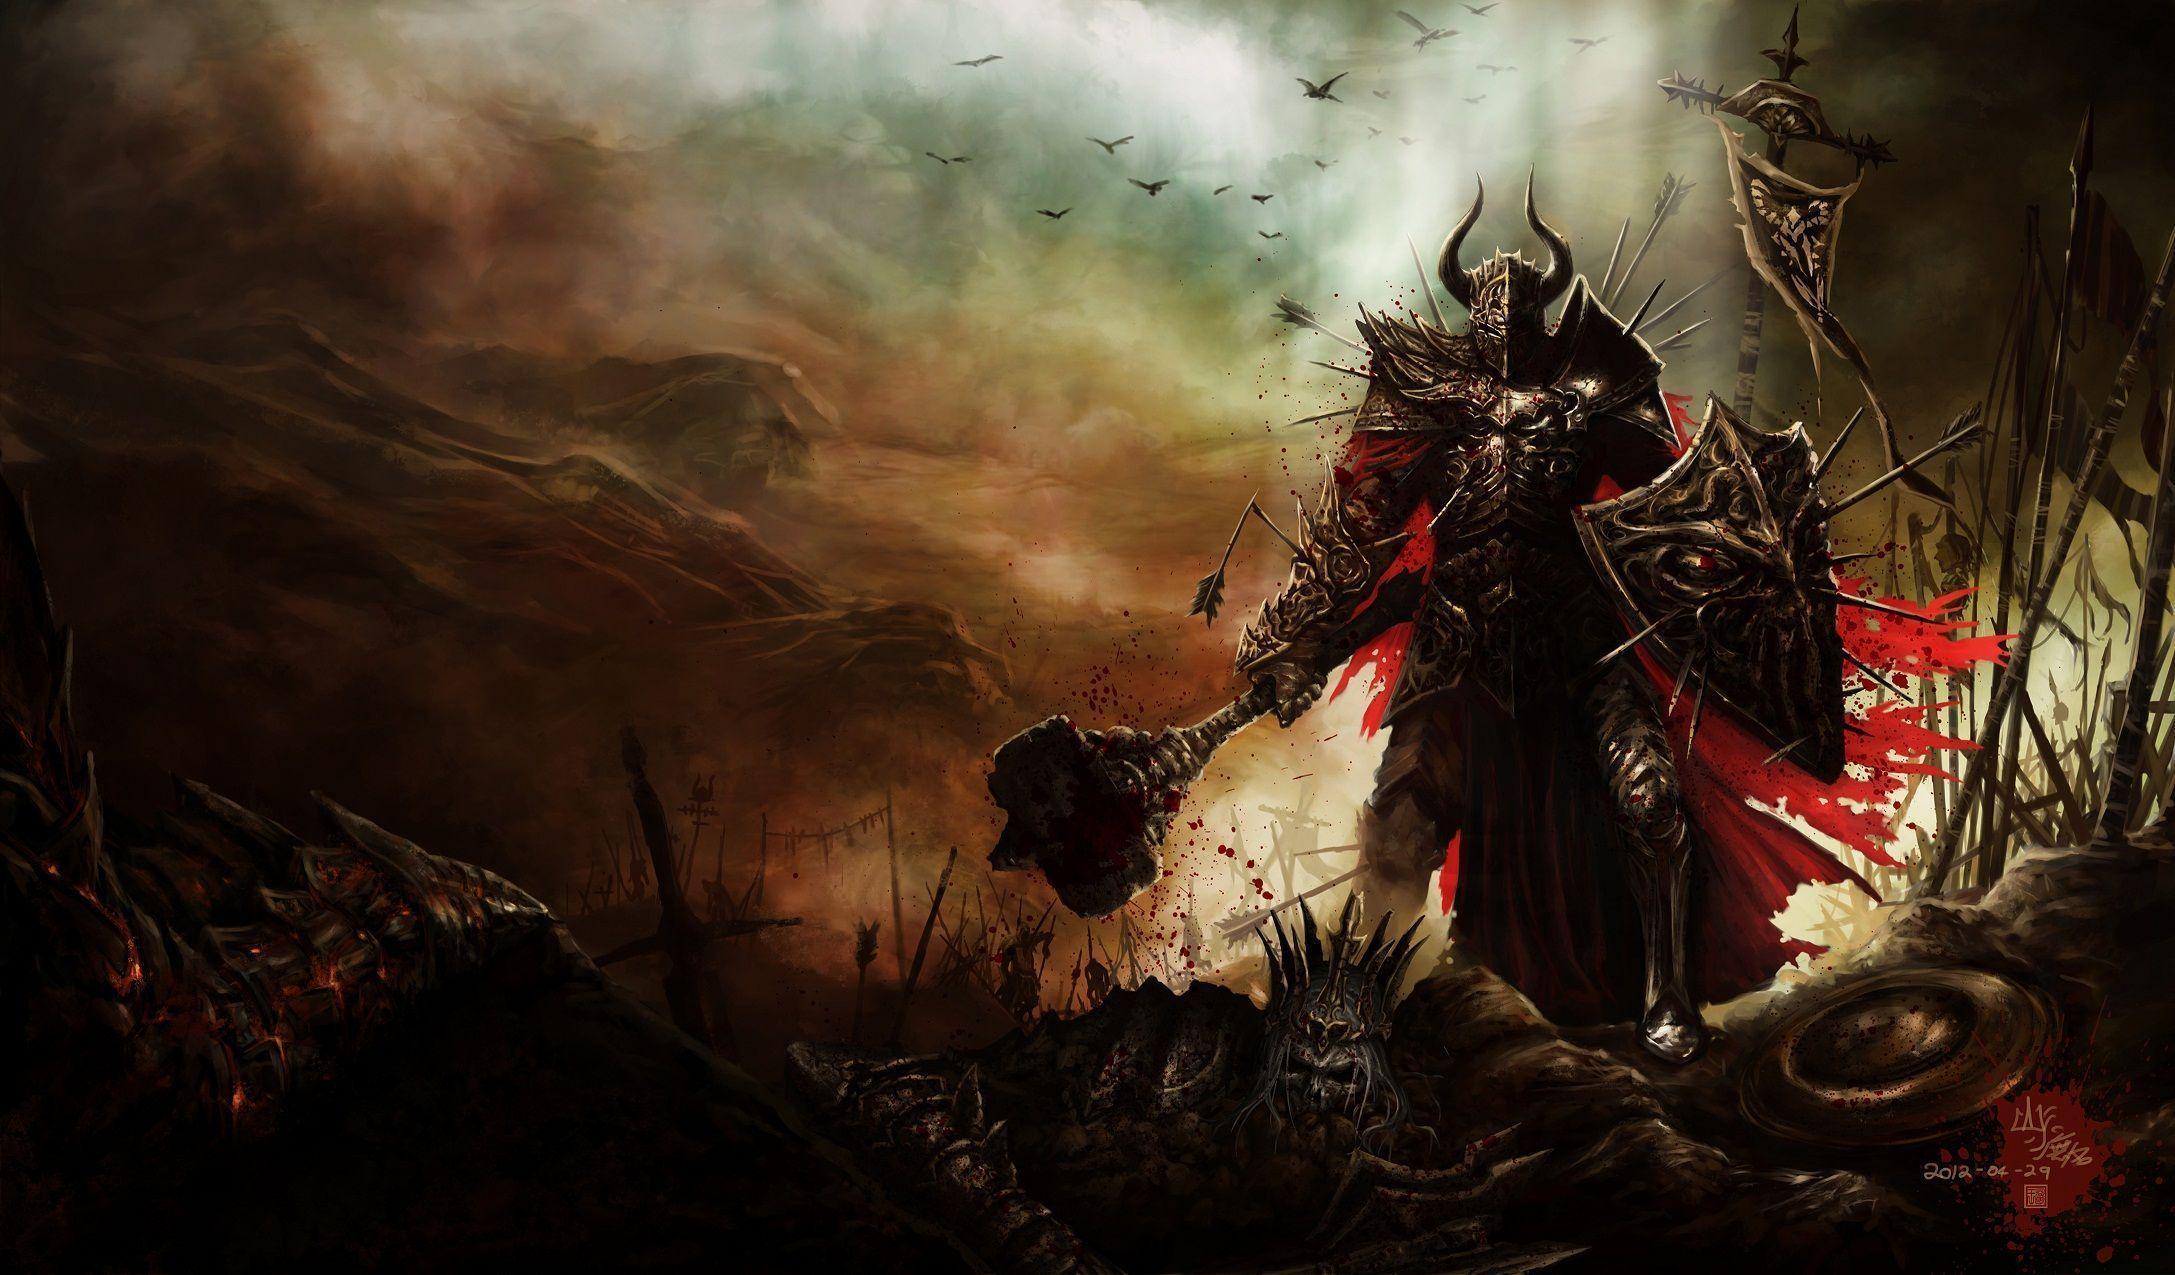 Diablo 3 ROS HD Wallpaper | PicMyGame